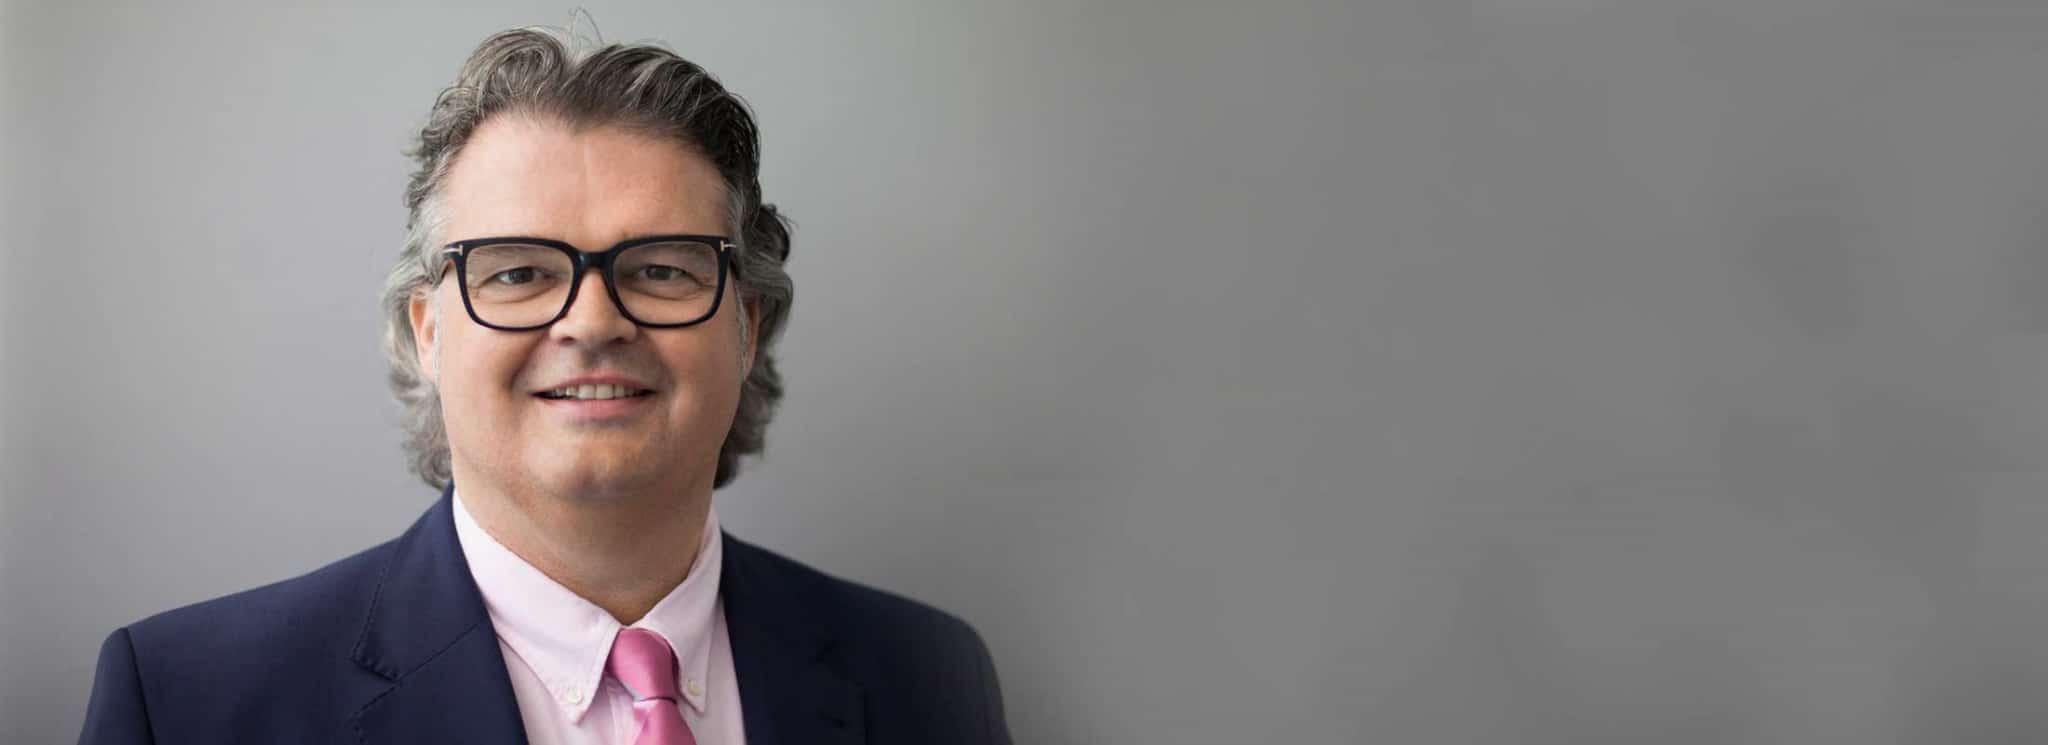 Thomas Gfrörer, Rechtsanwalt und Partner